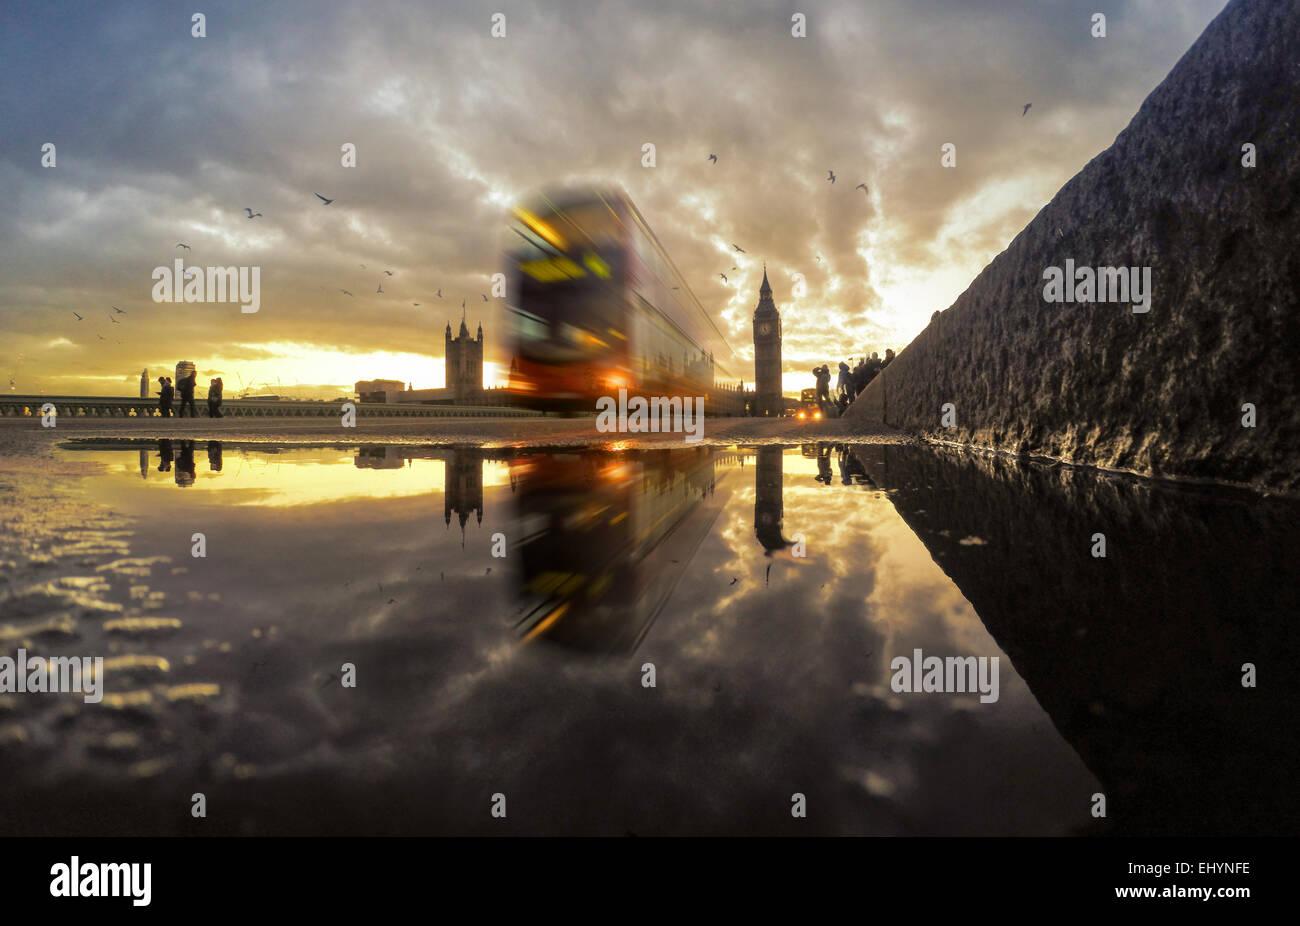 Bus driving across Westminster Bridge at sunset, England, UK Stock Photo